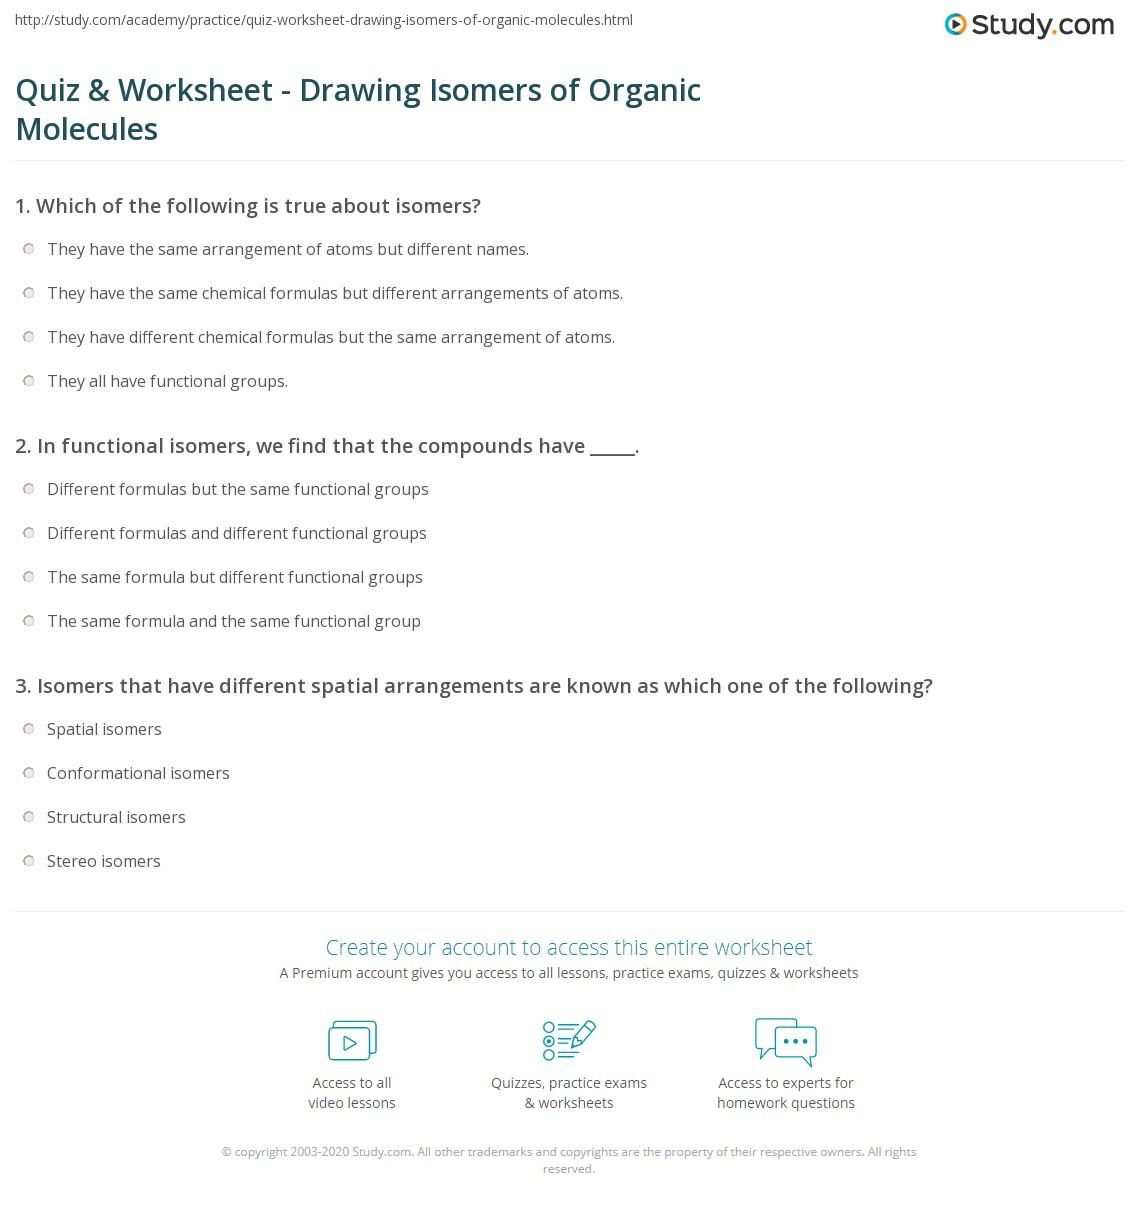 Quiz Worksheet Drawing Isomers Of Organic Molecules Study